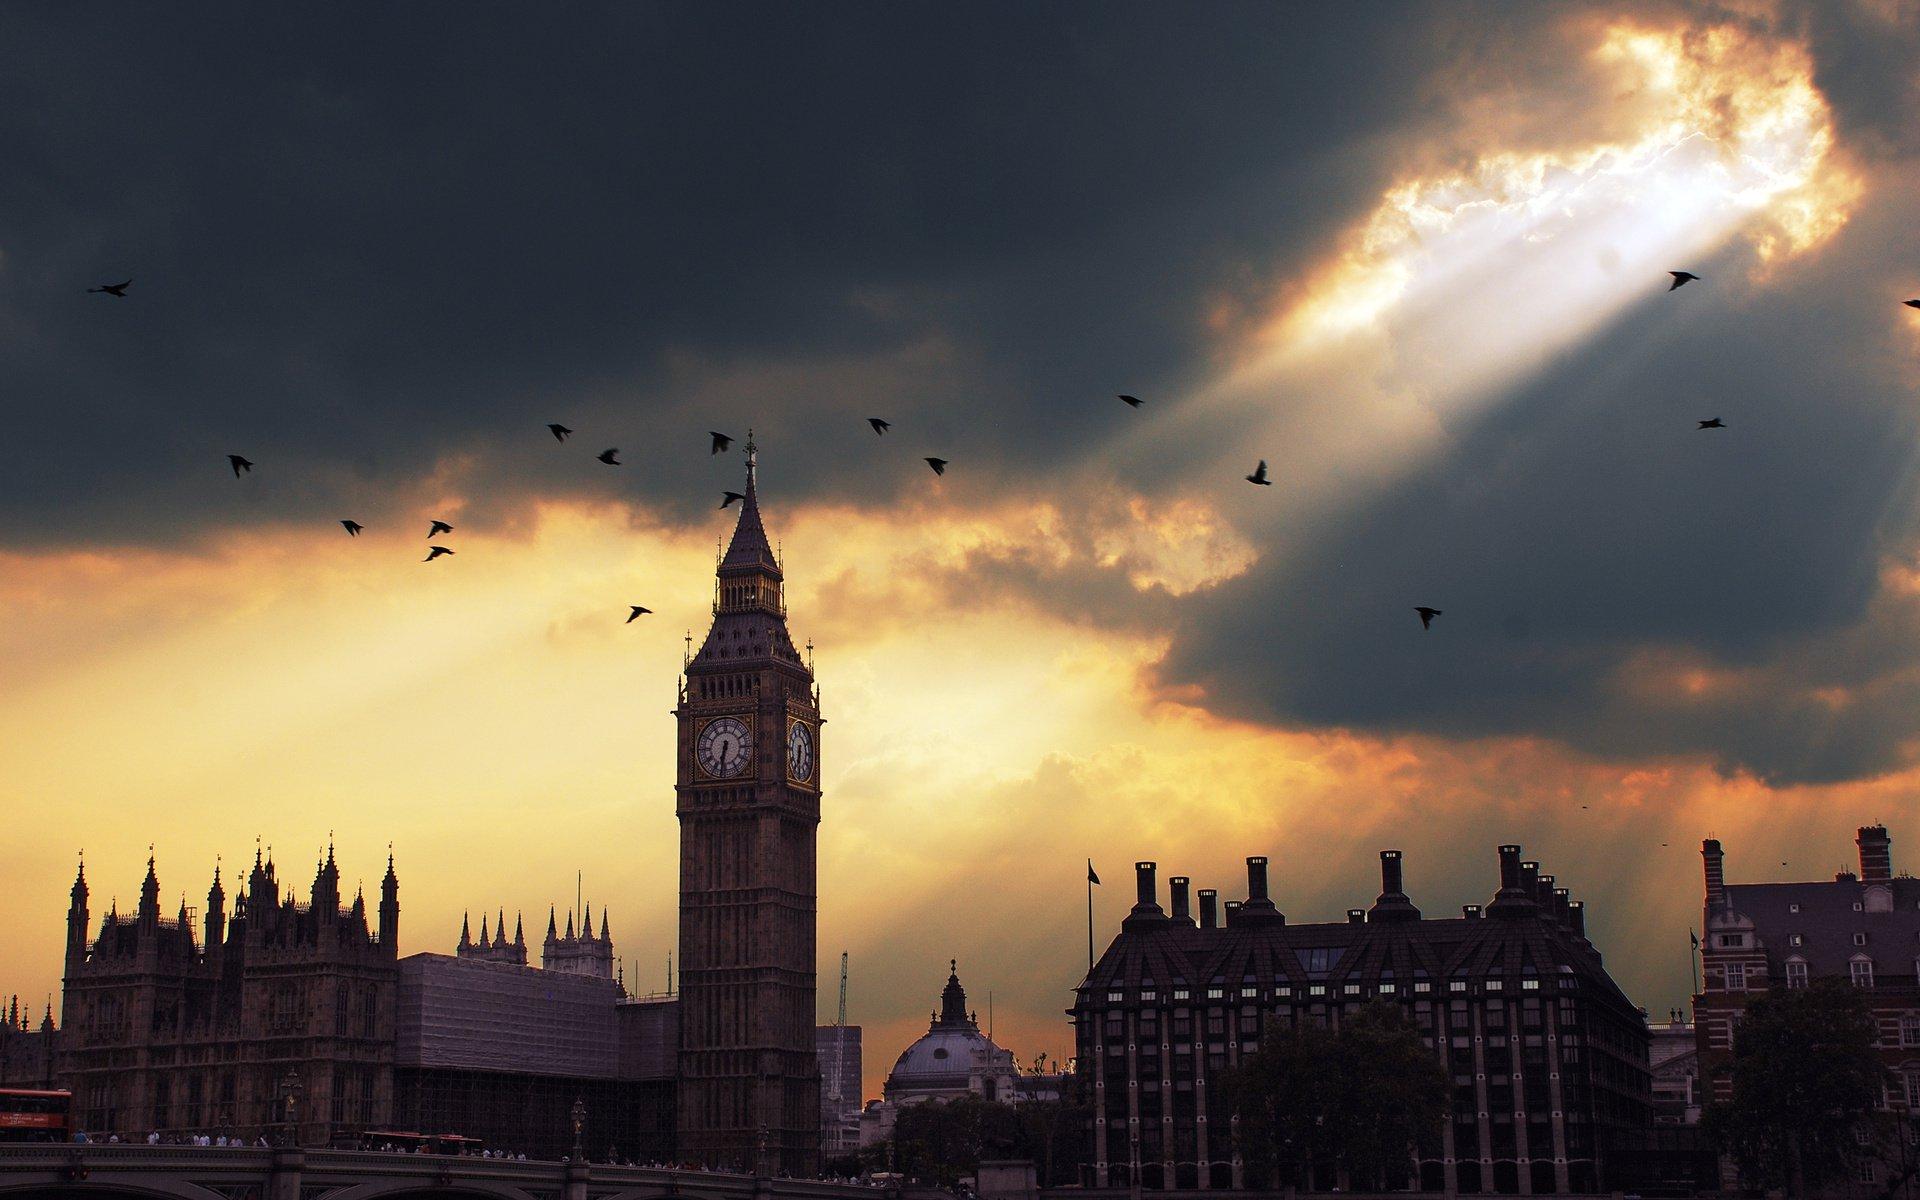 london_sunset-wide